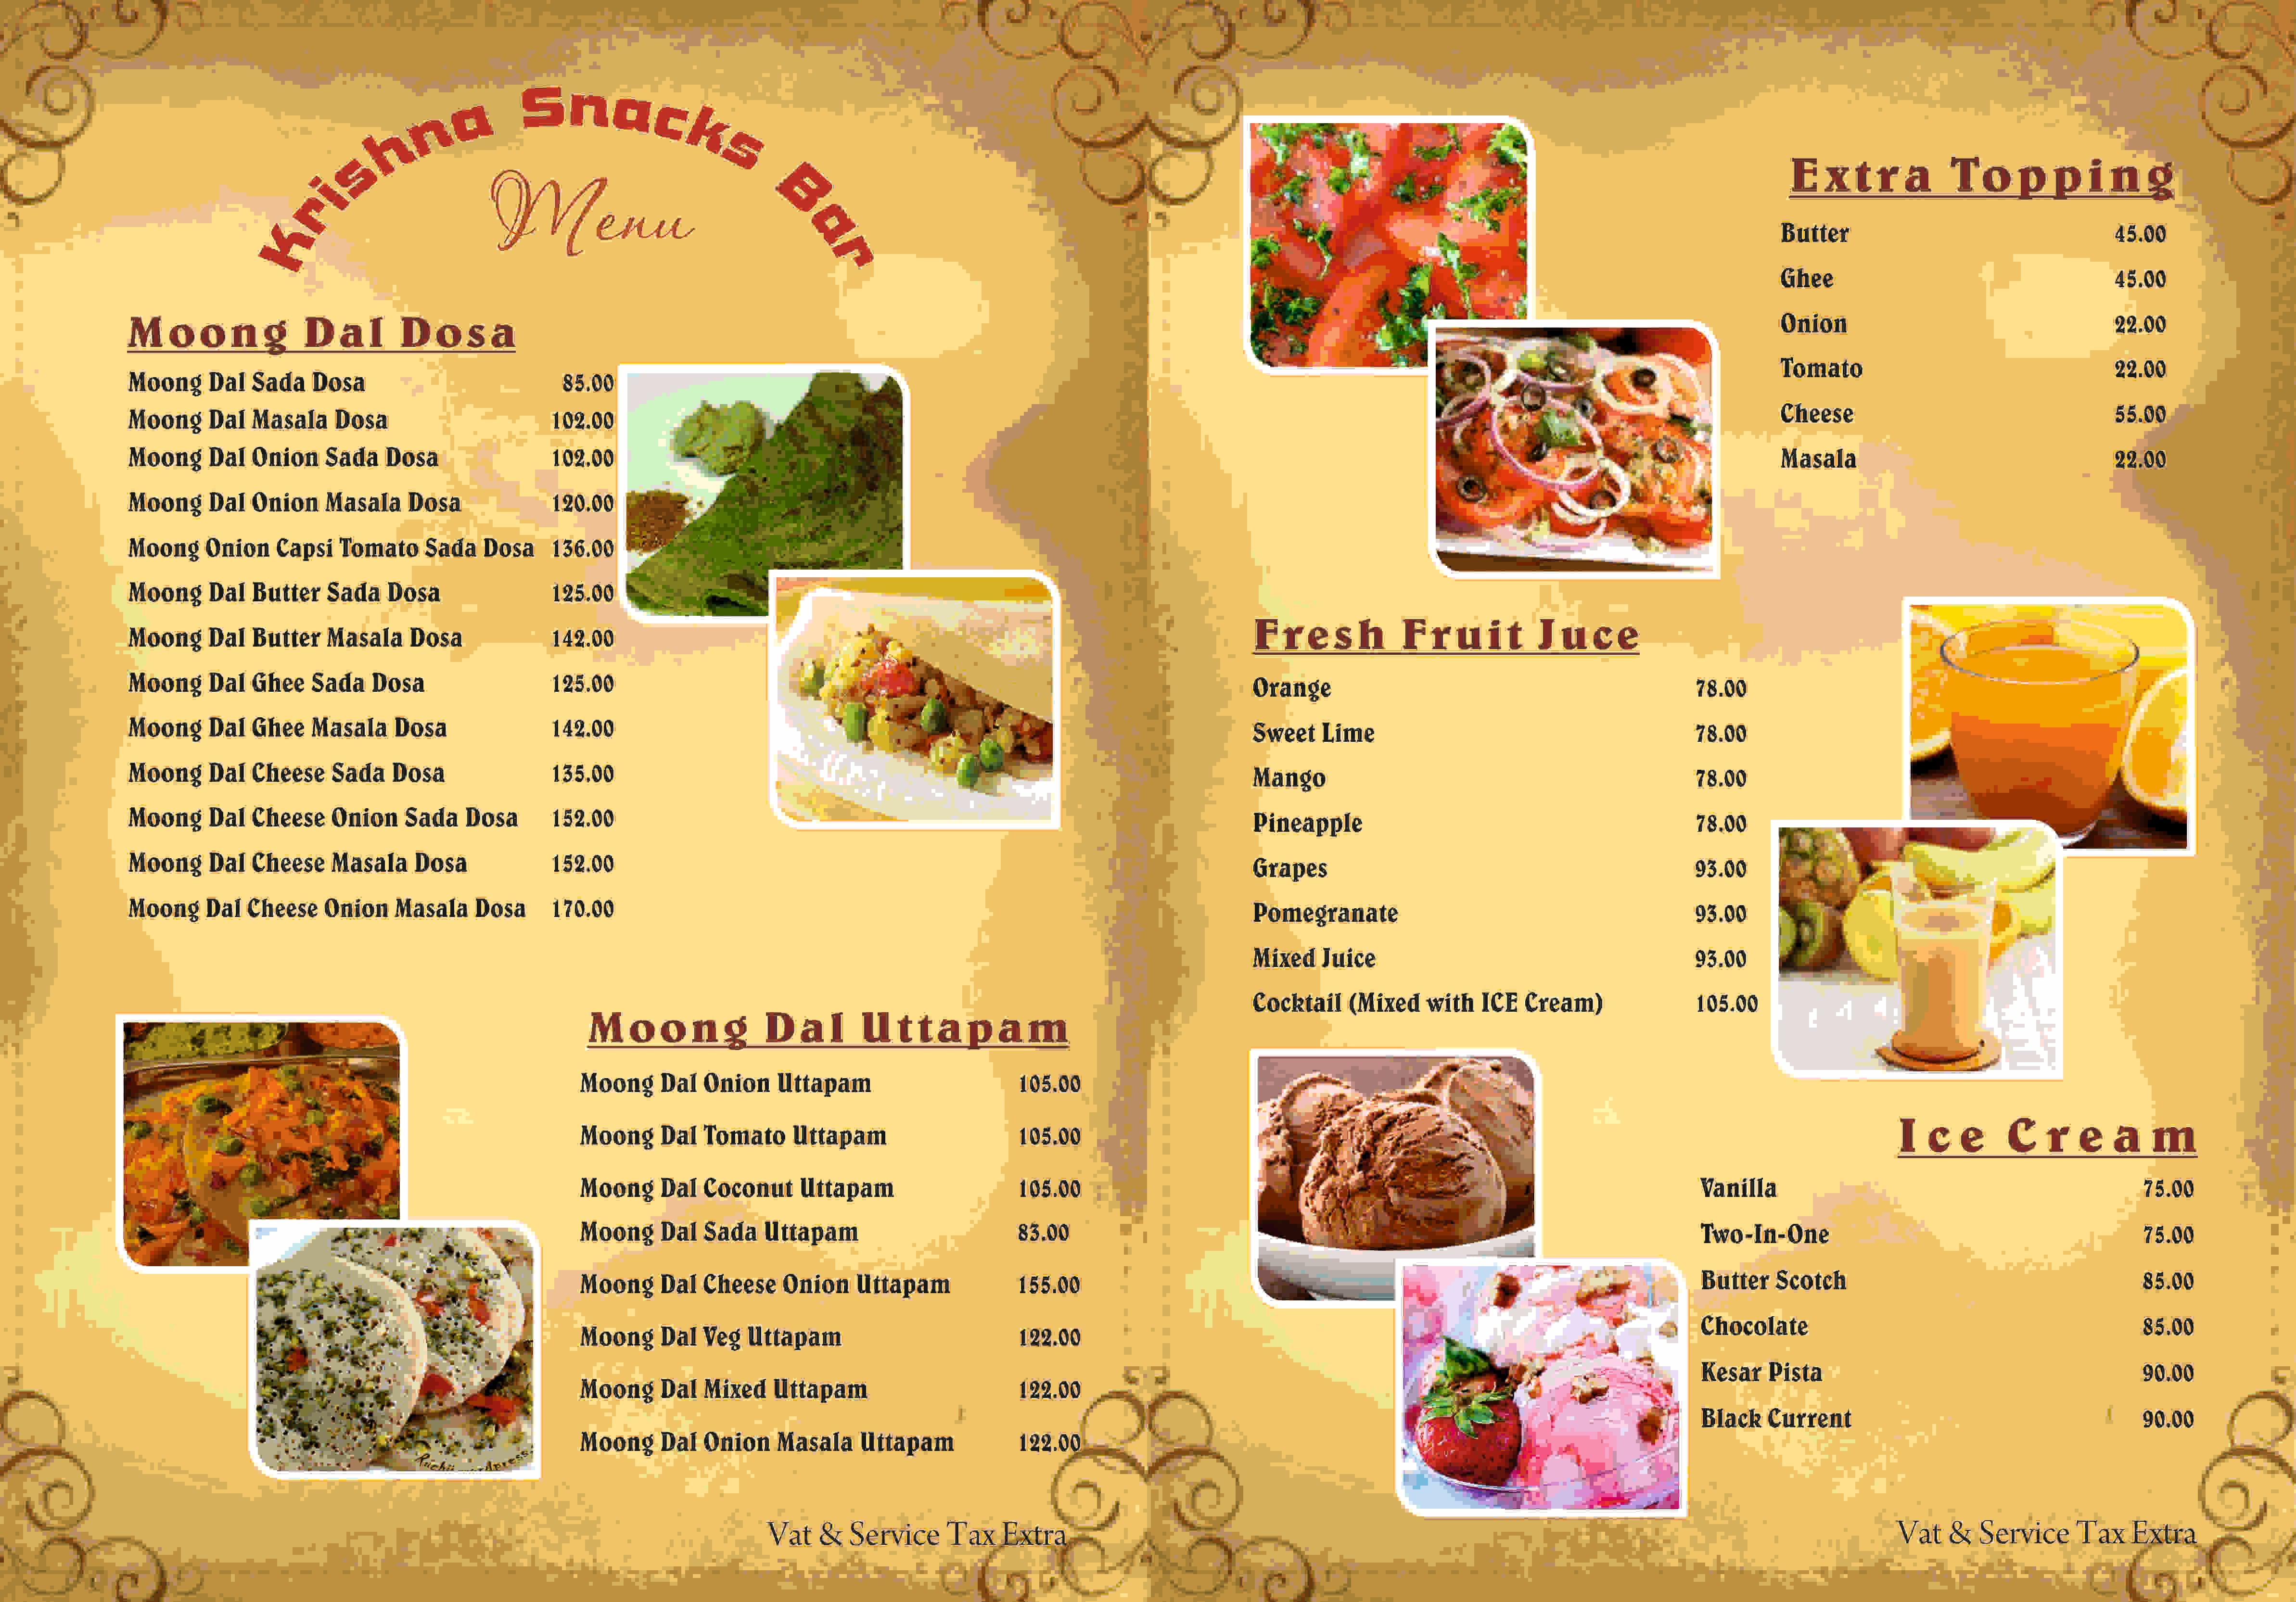 Krishna snacks bar menu menu for krishna snacks bar new for Snack bar menu